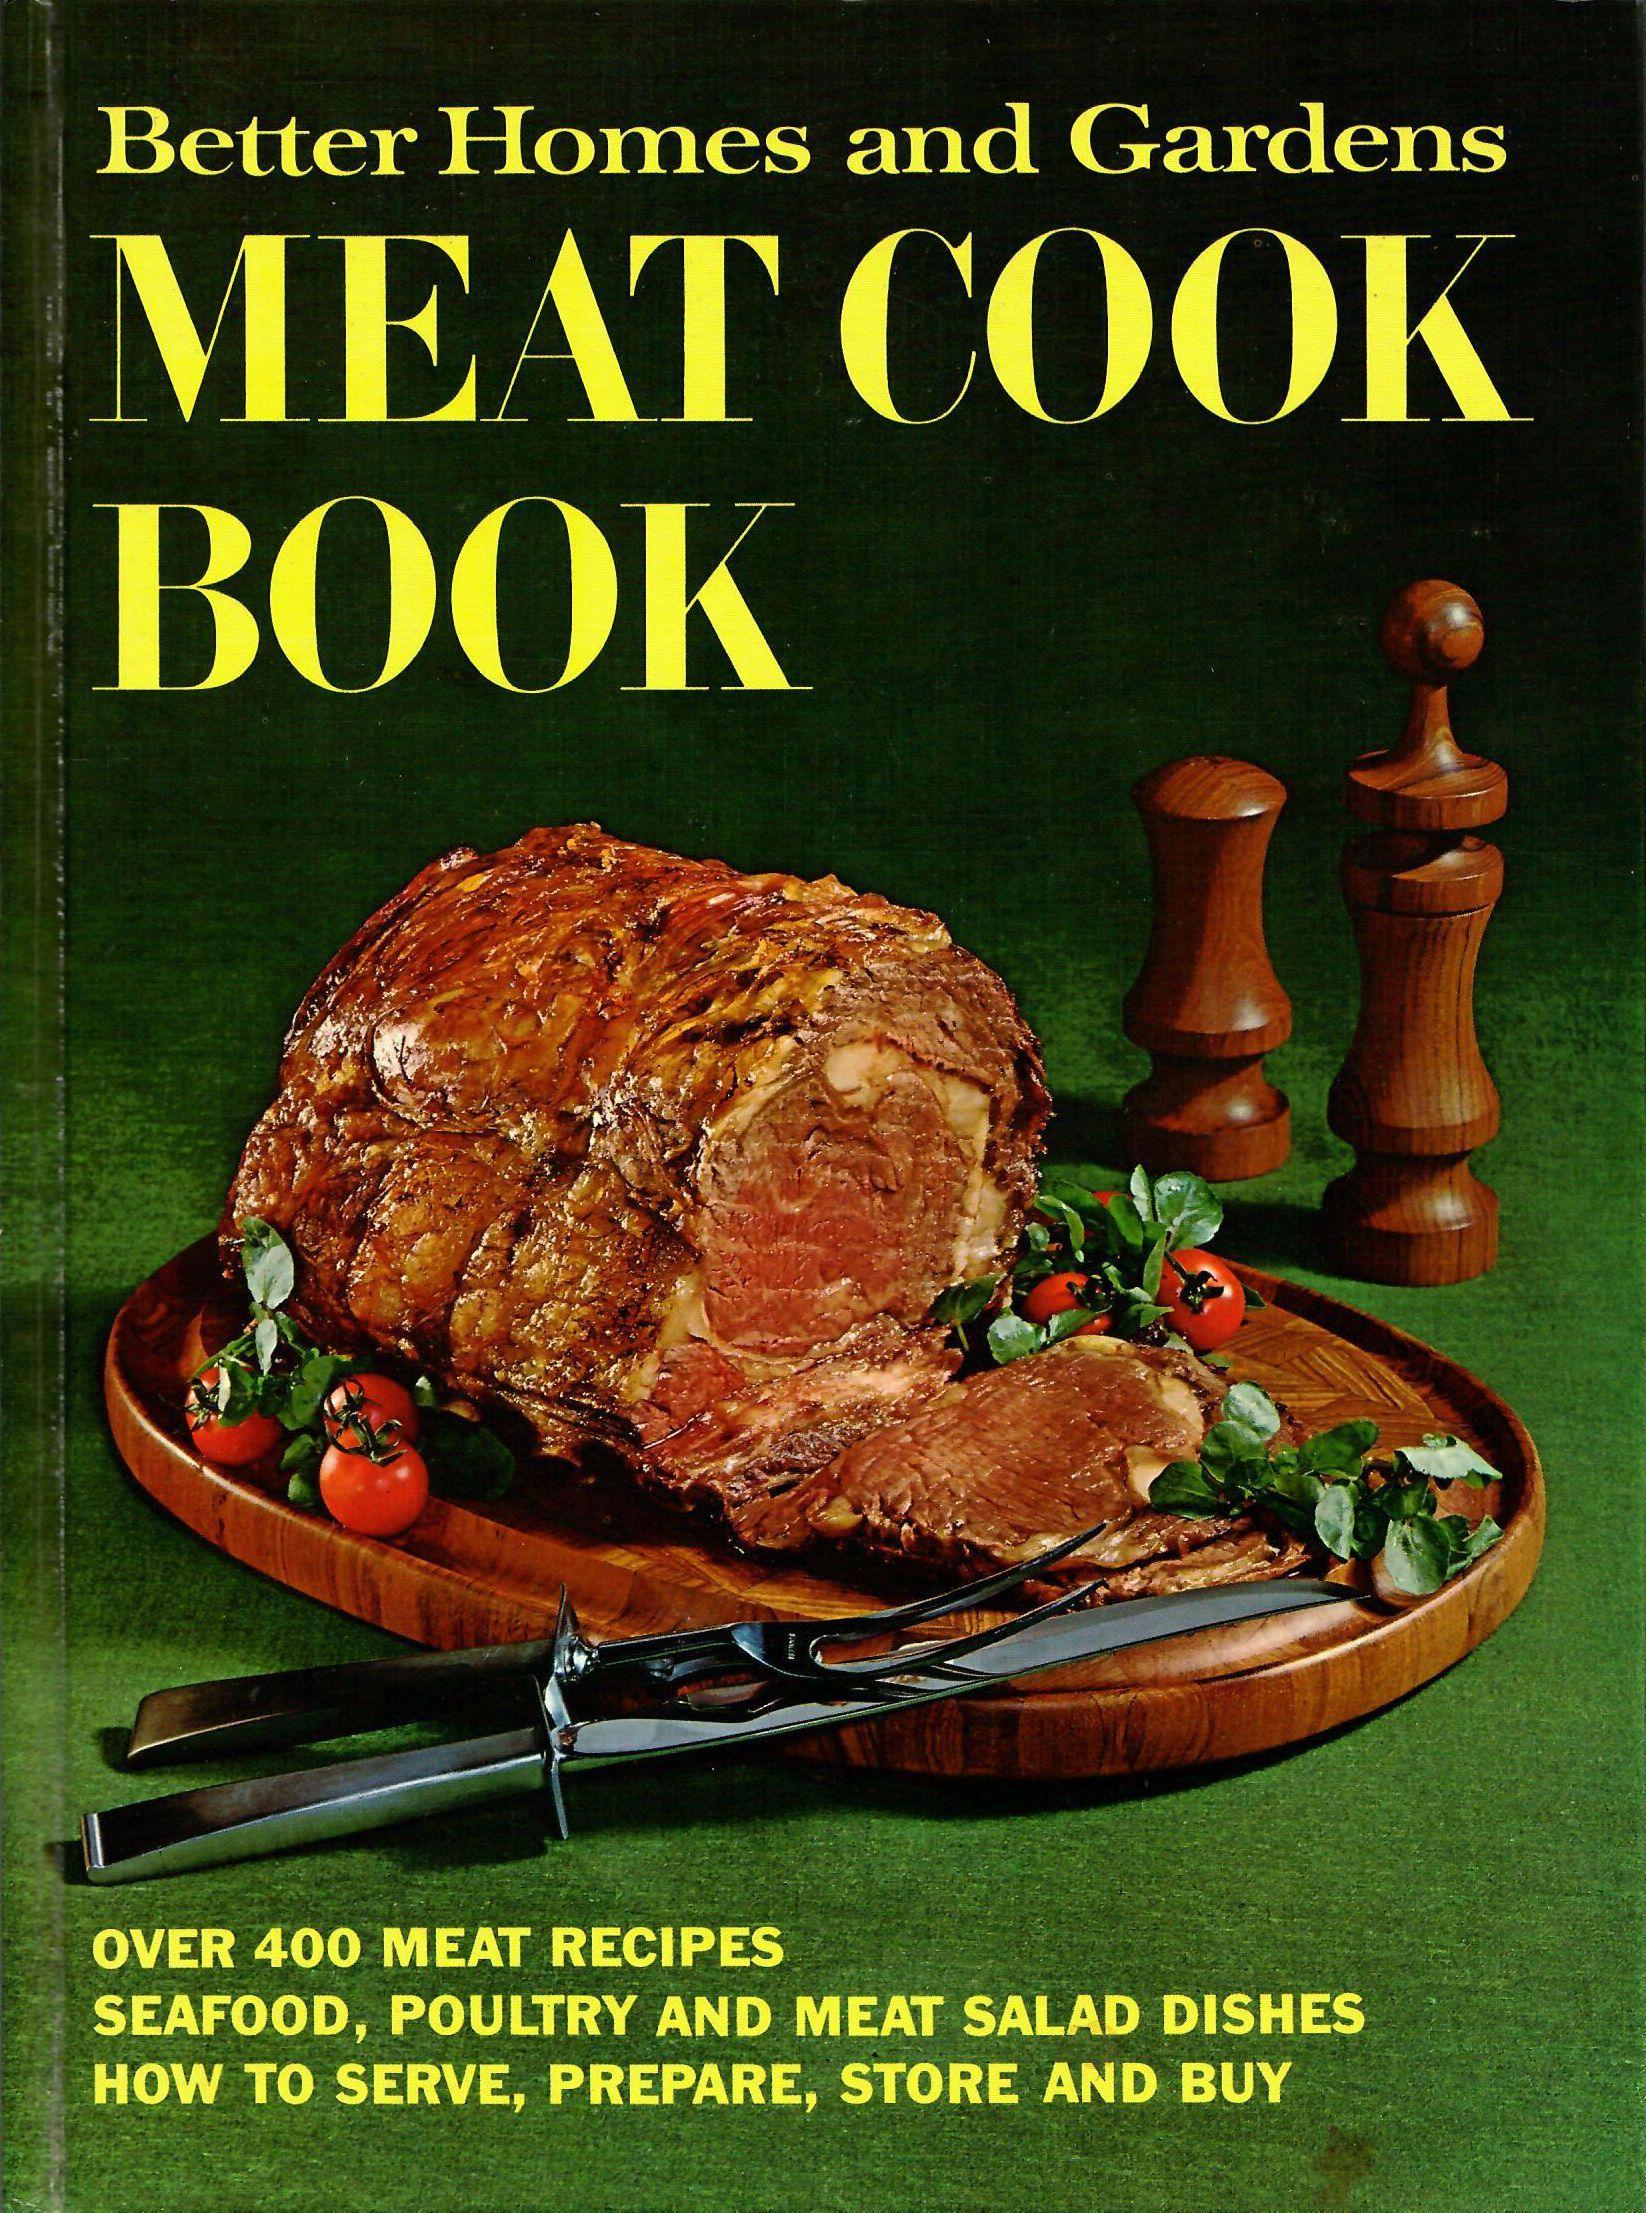 fc66d60678bf09330dda691d0ac34659 - Better Homes And Gardens Cookbooks List